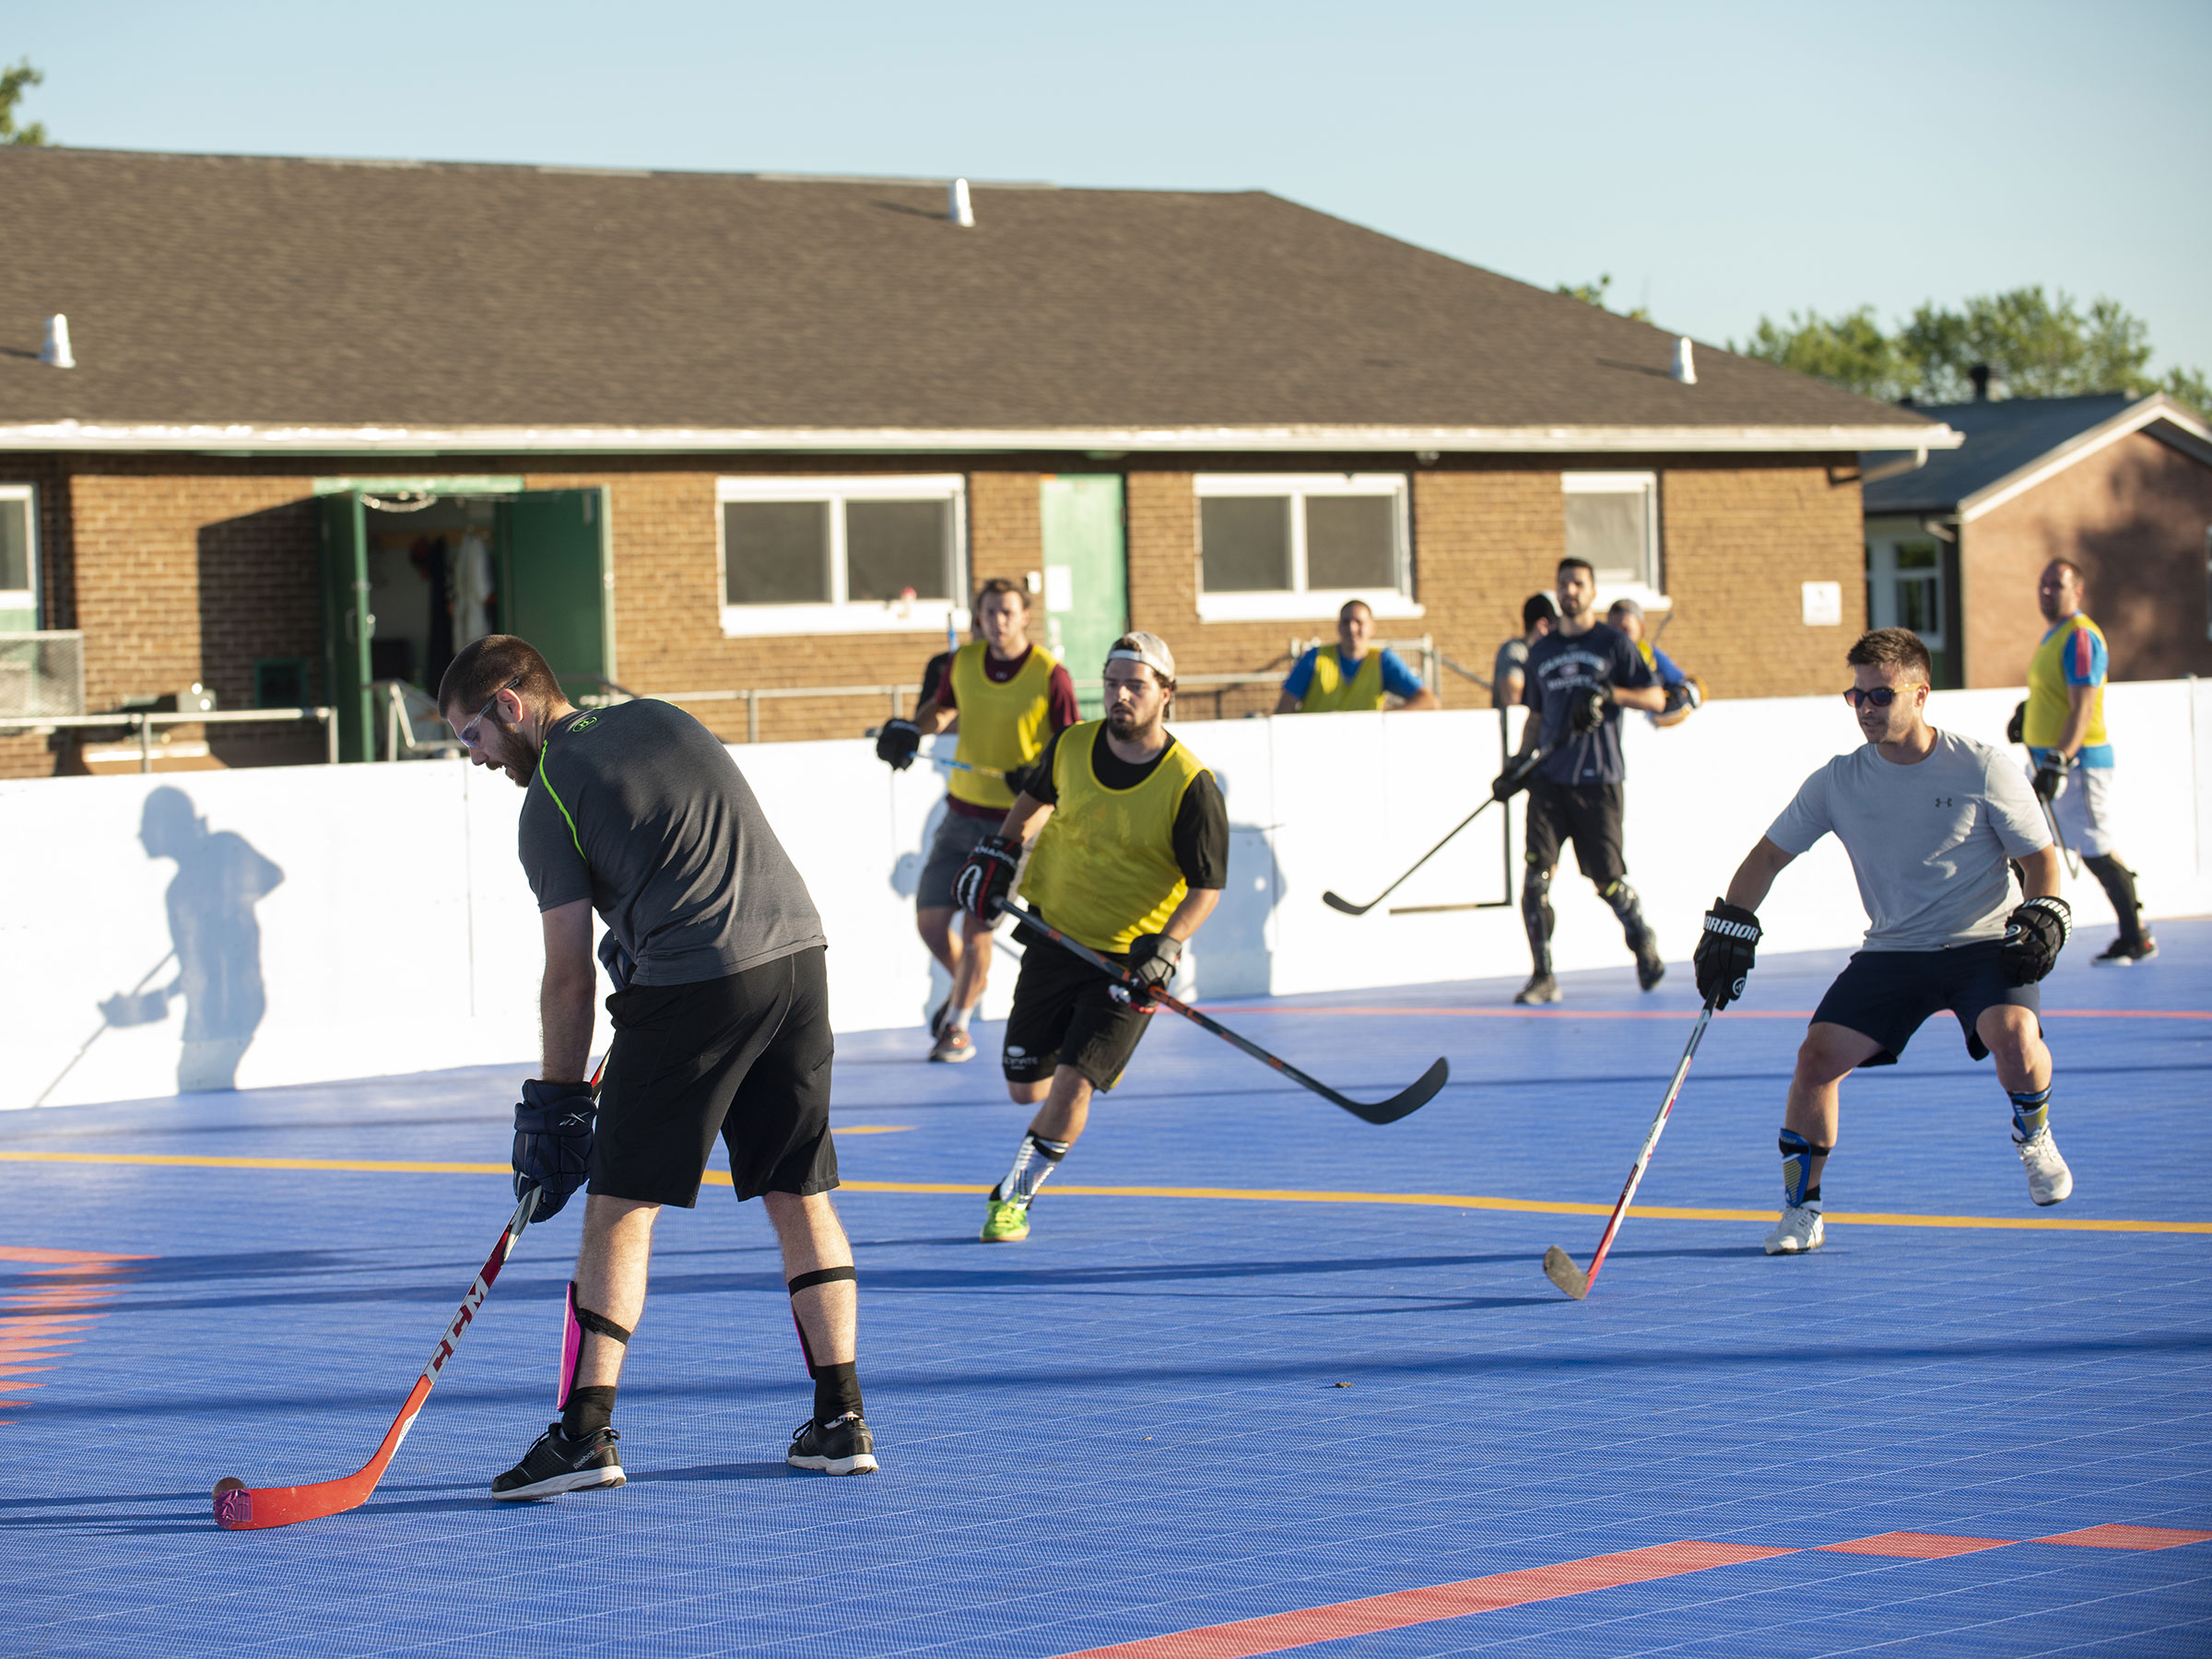 Surface de Dek hockey